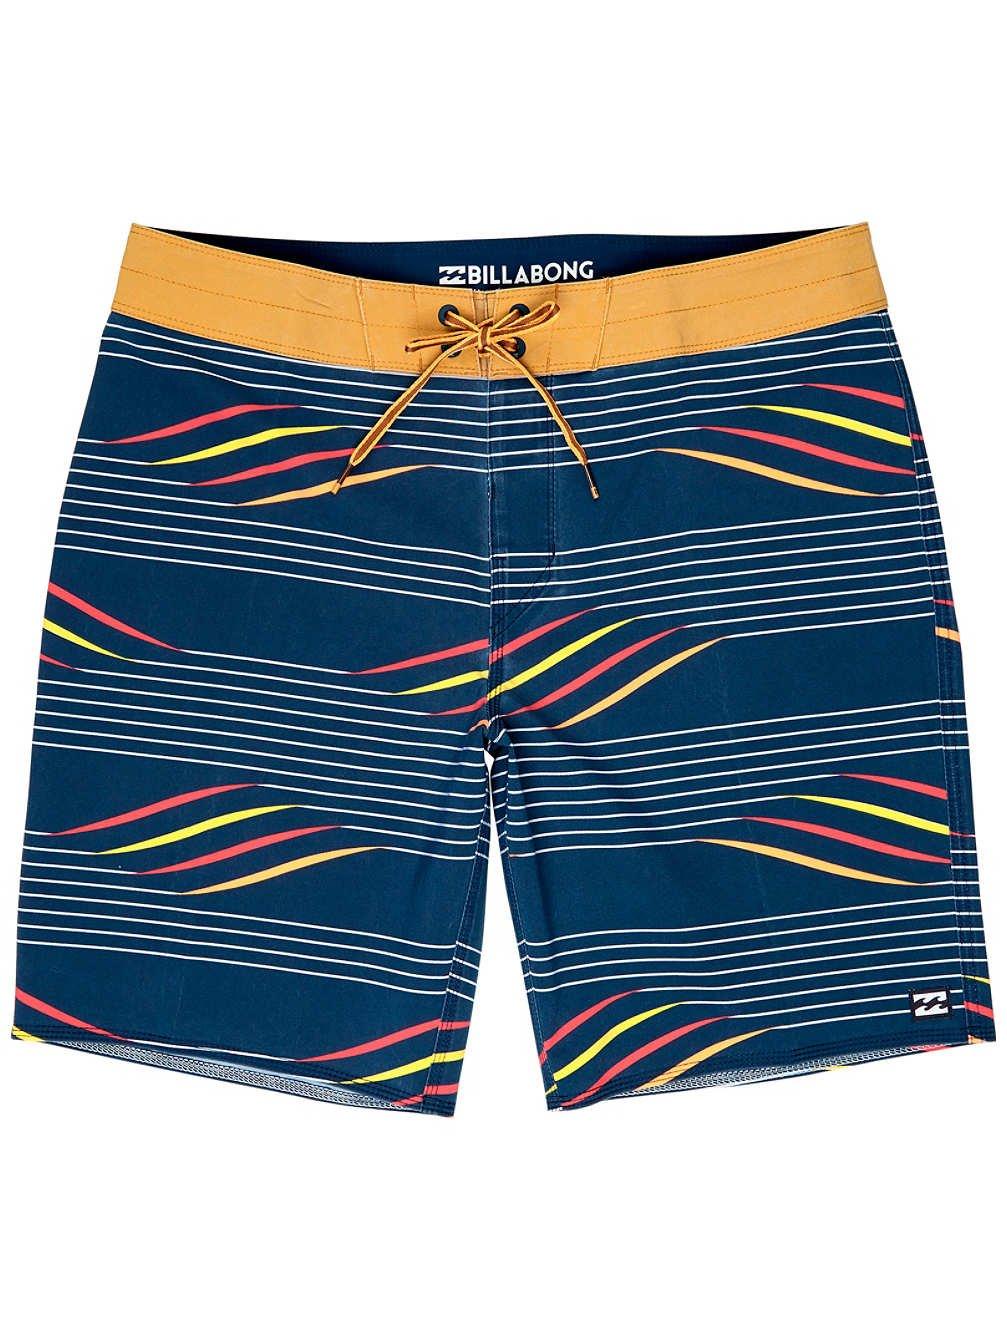 Billabong Herren Boardshorts Sundays X Stripe 18 Boardshorts